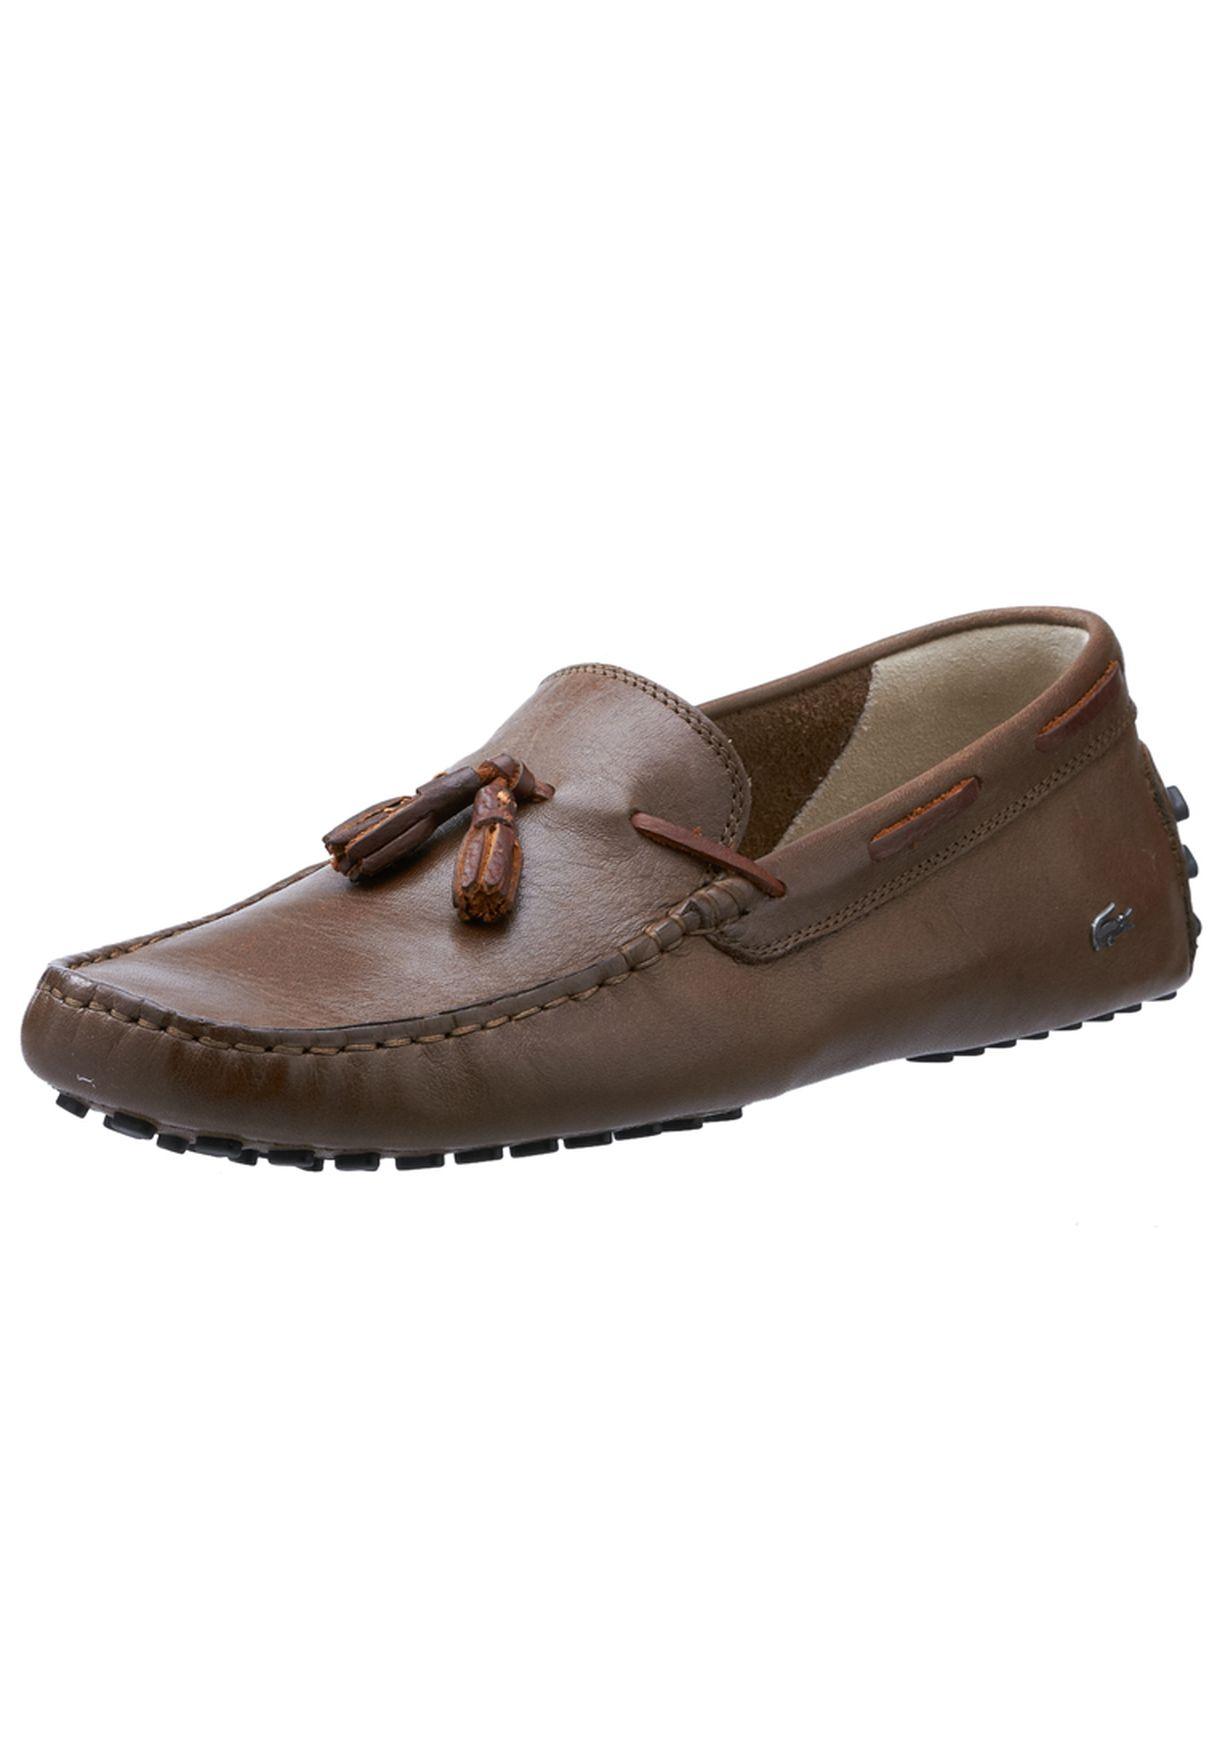 b83365fa8342d6 Shop Lacoste browns Concours Tassle Slipons 24CLM3202-176 for Men in ...